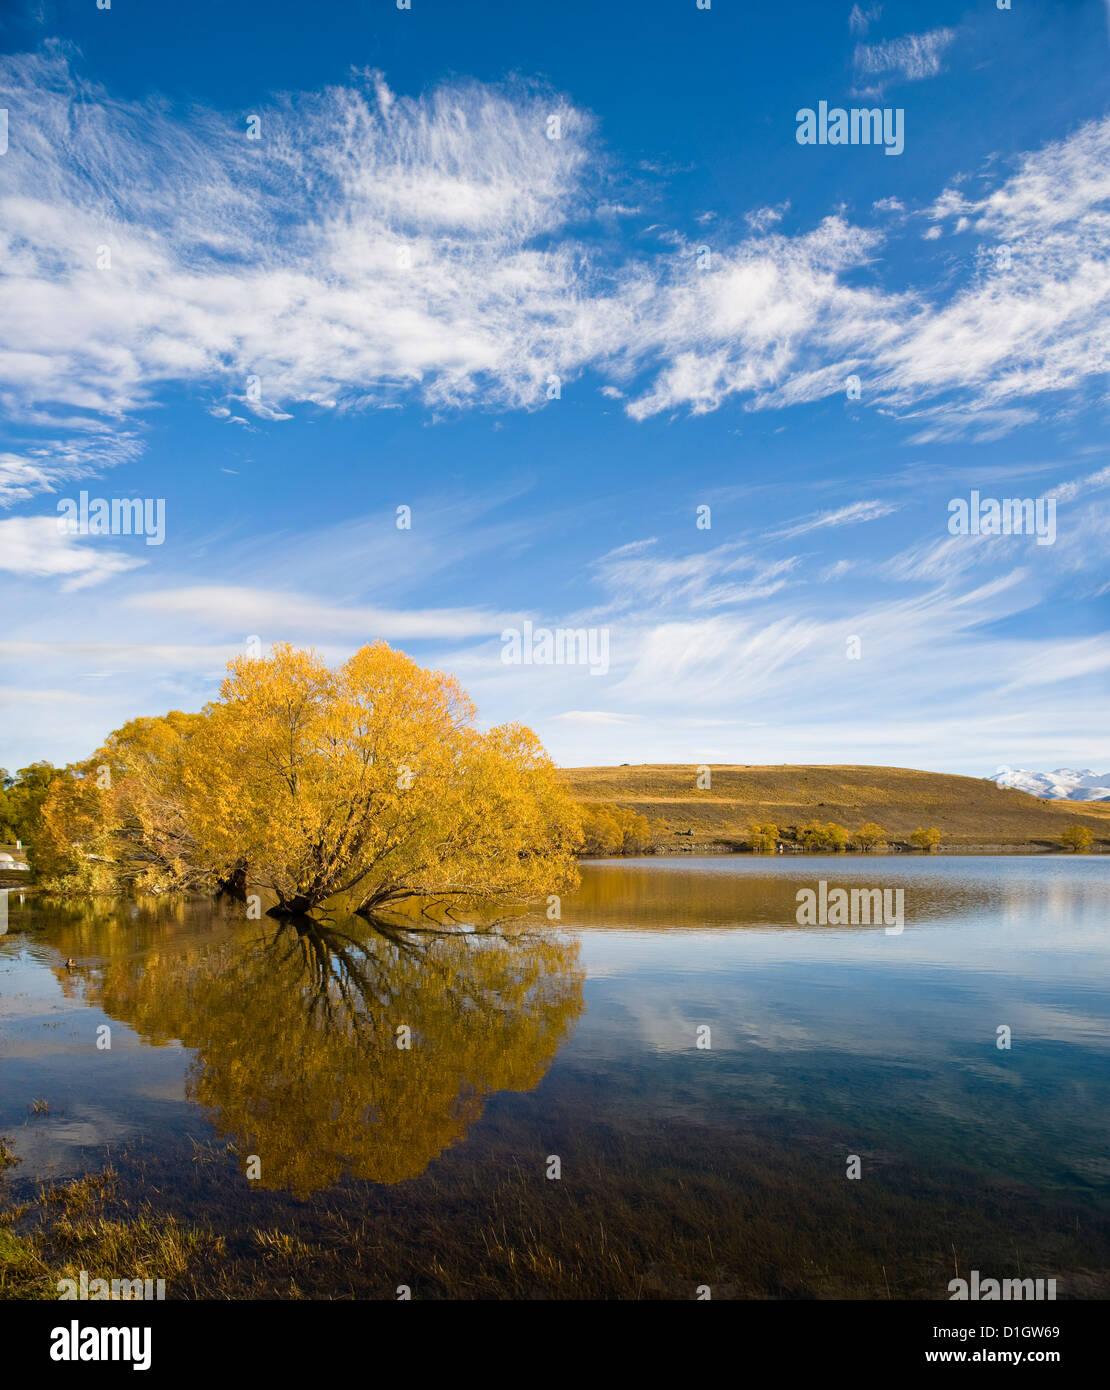 Goldenen Herbst Baum Reflexion noch morgens Wasser, Lake Alexandrina, Southern Lakes Otago Region, Südinsel, Stockbild